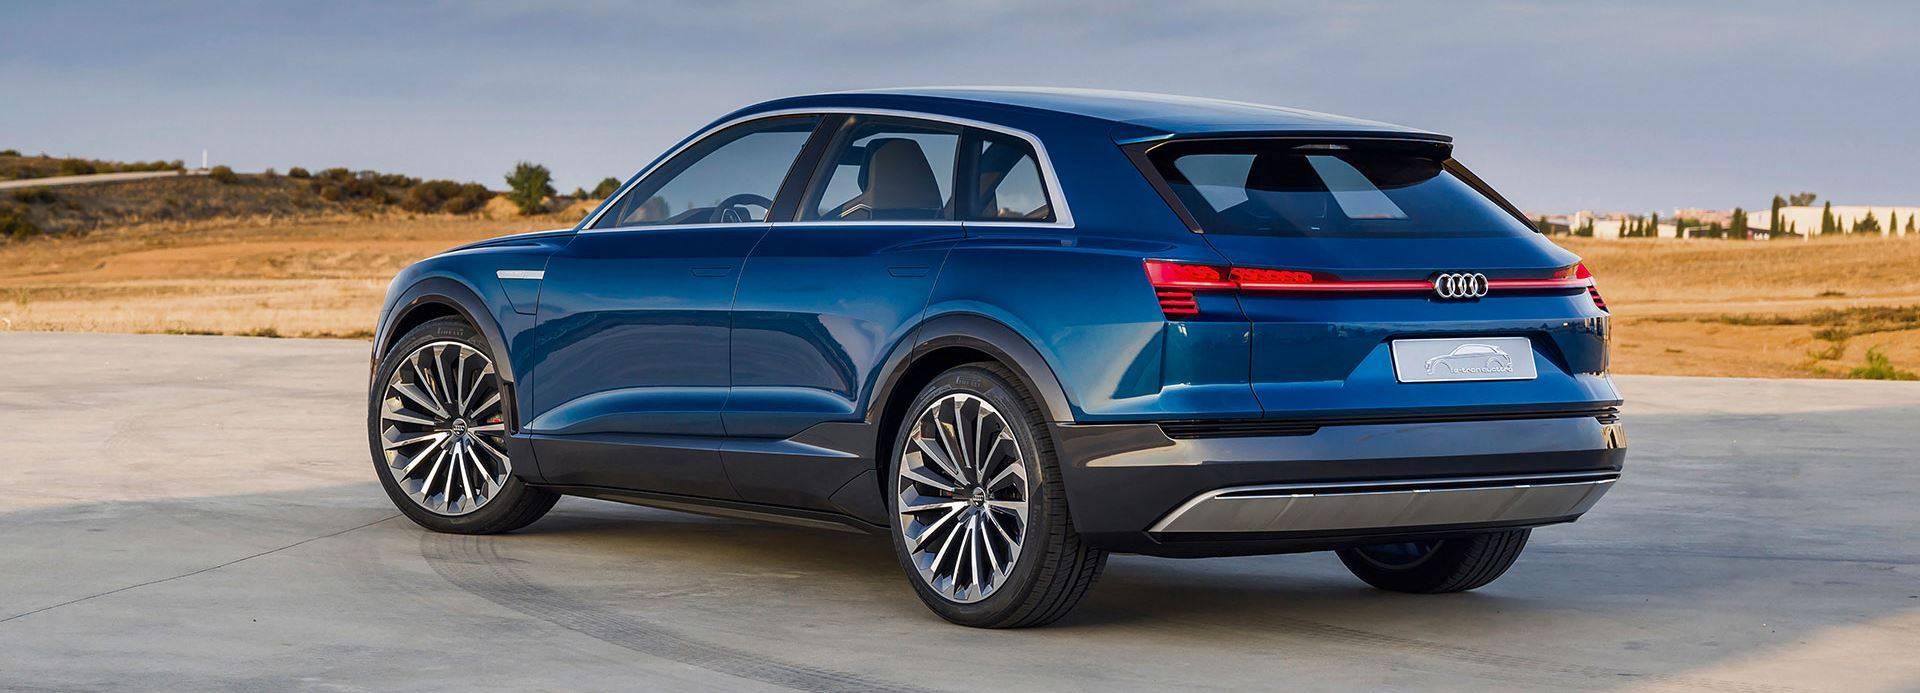 Audi e-tron quattro concept 2018 bleu